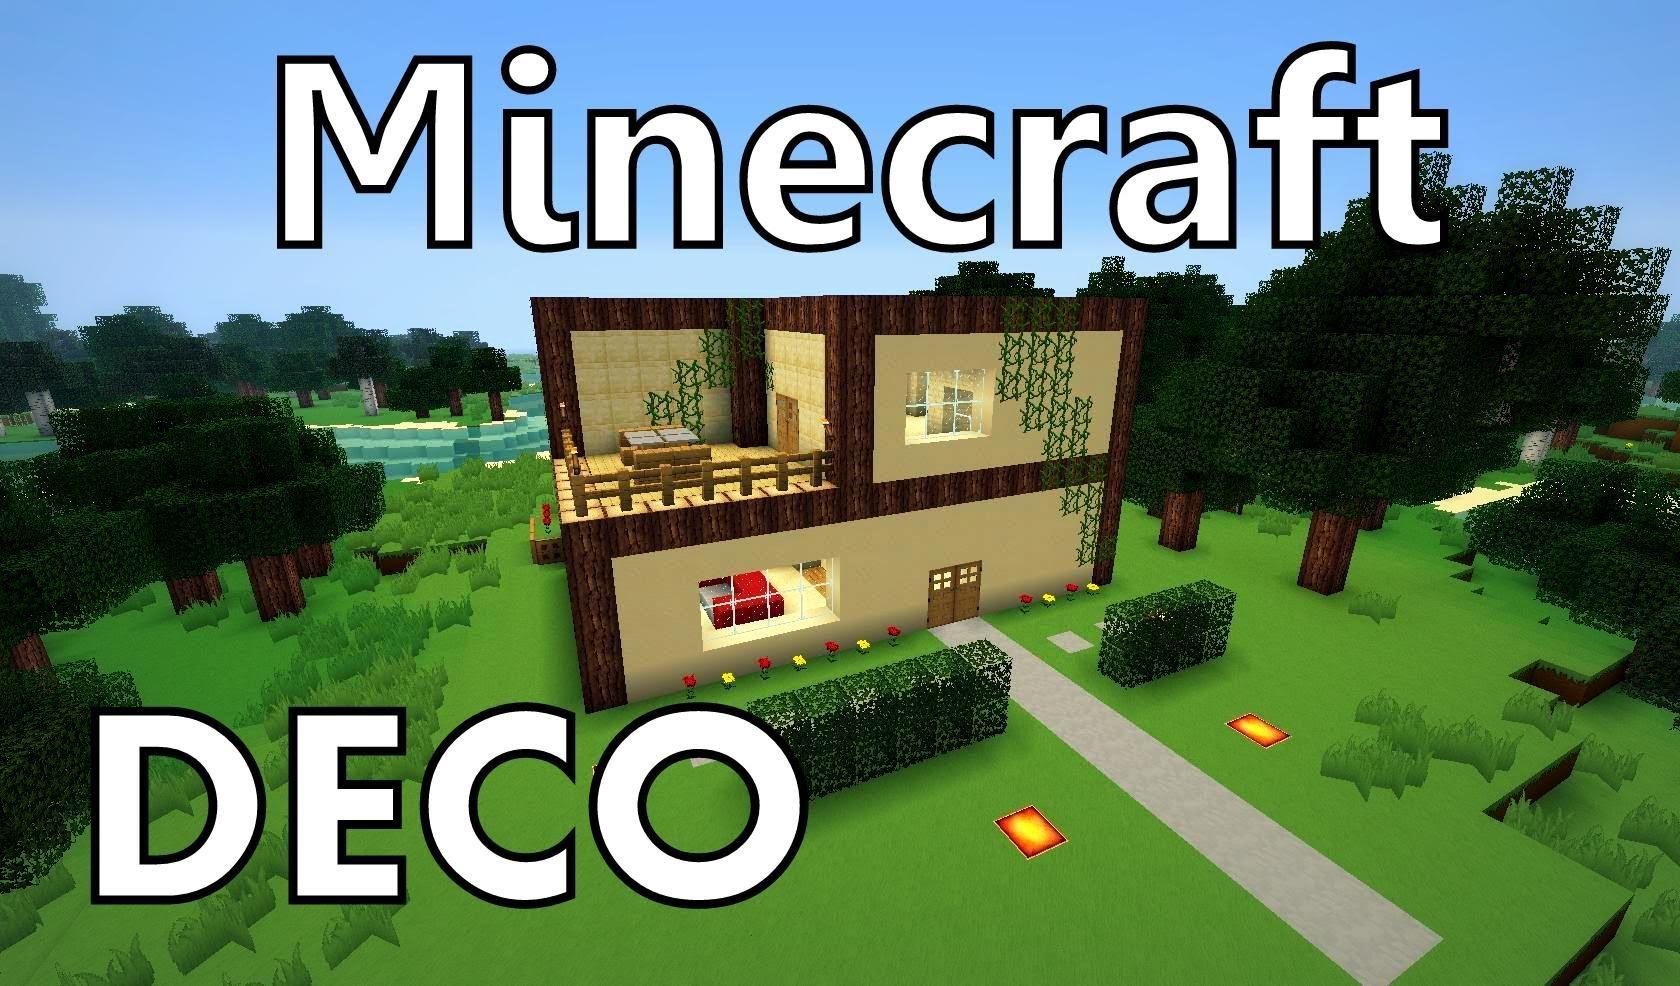 Minecraft comment faire une villa l 39 impression 3d for Comment faire une petite maison minecraft